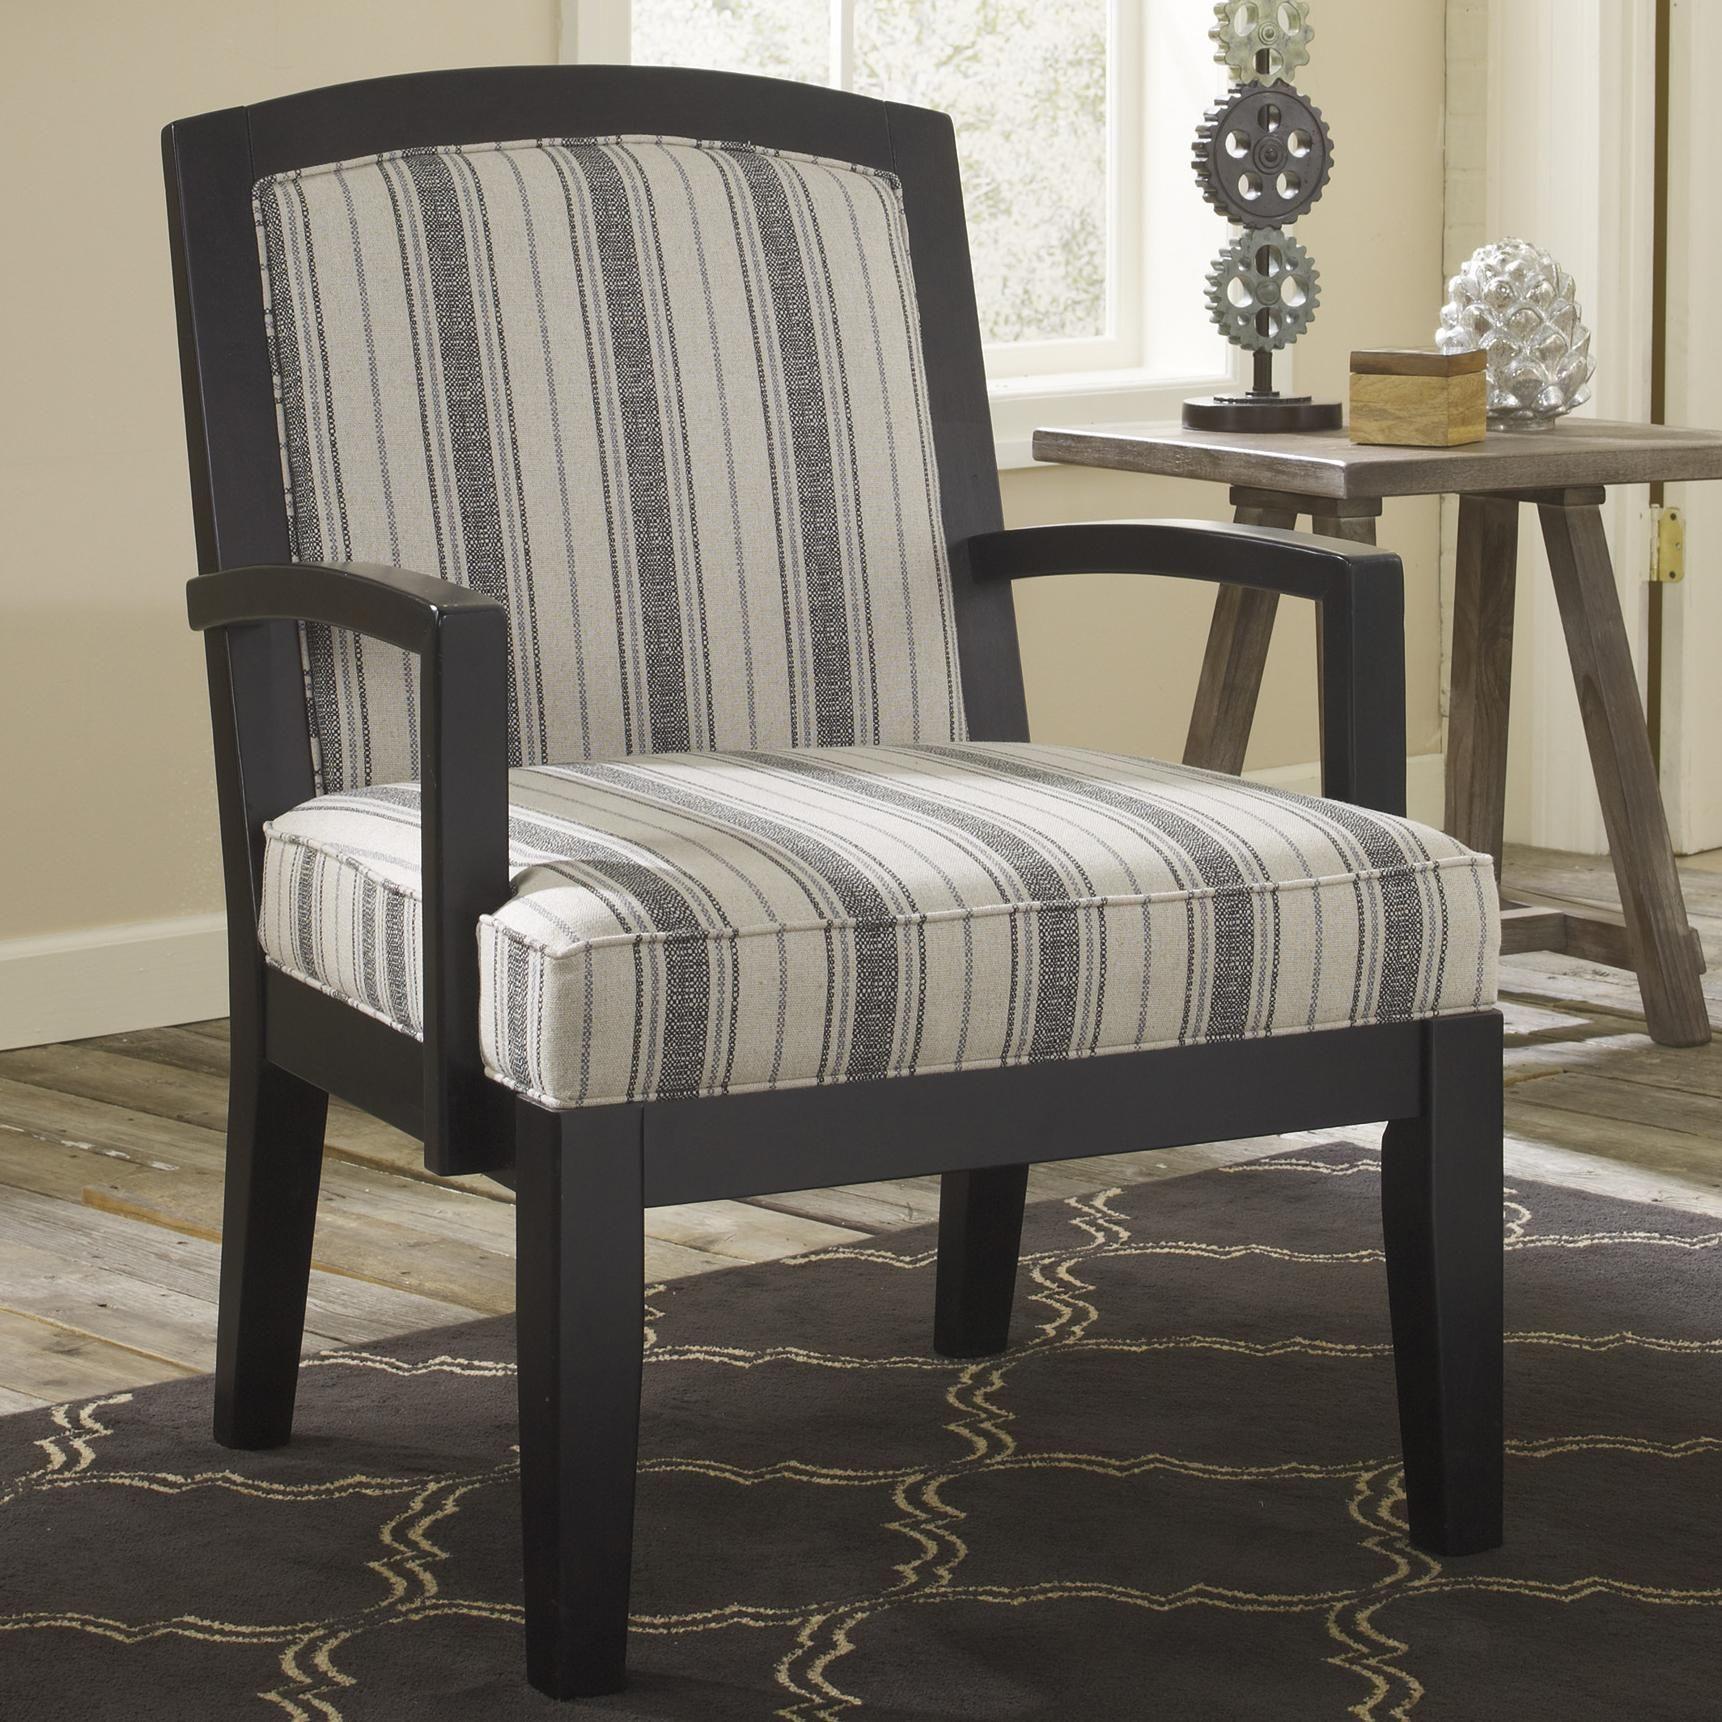 Alenya Quartz Accent Chair by Signature Design by Ashley